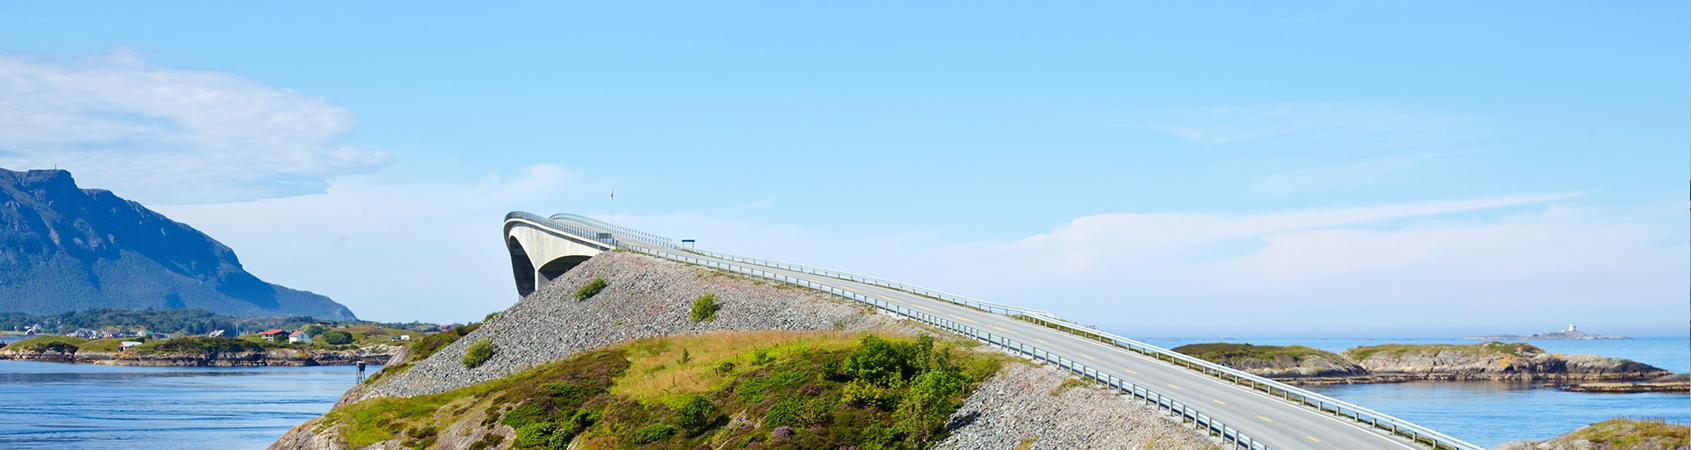 bridge europe sea track analyse optimise ubidata